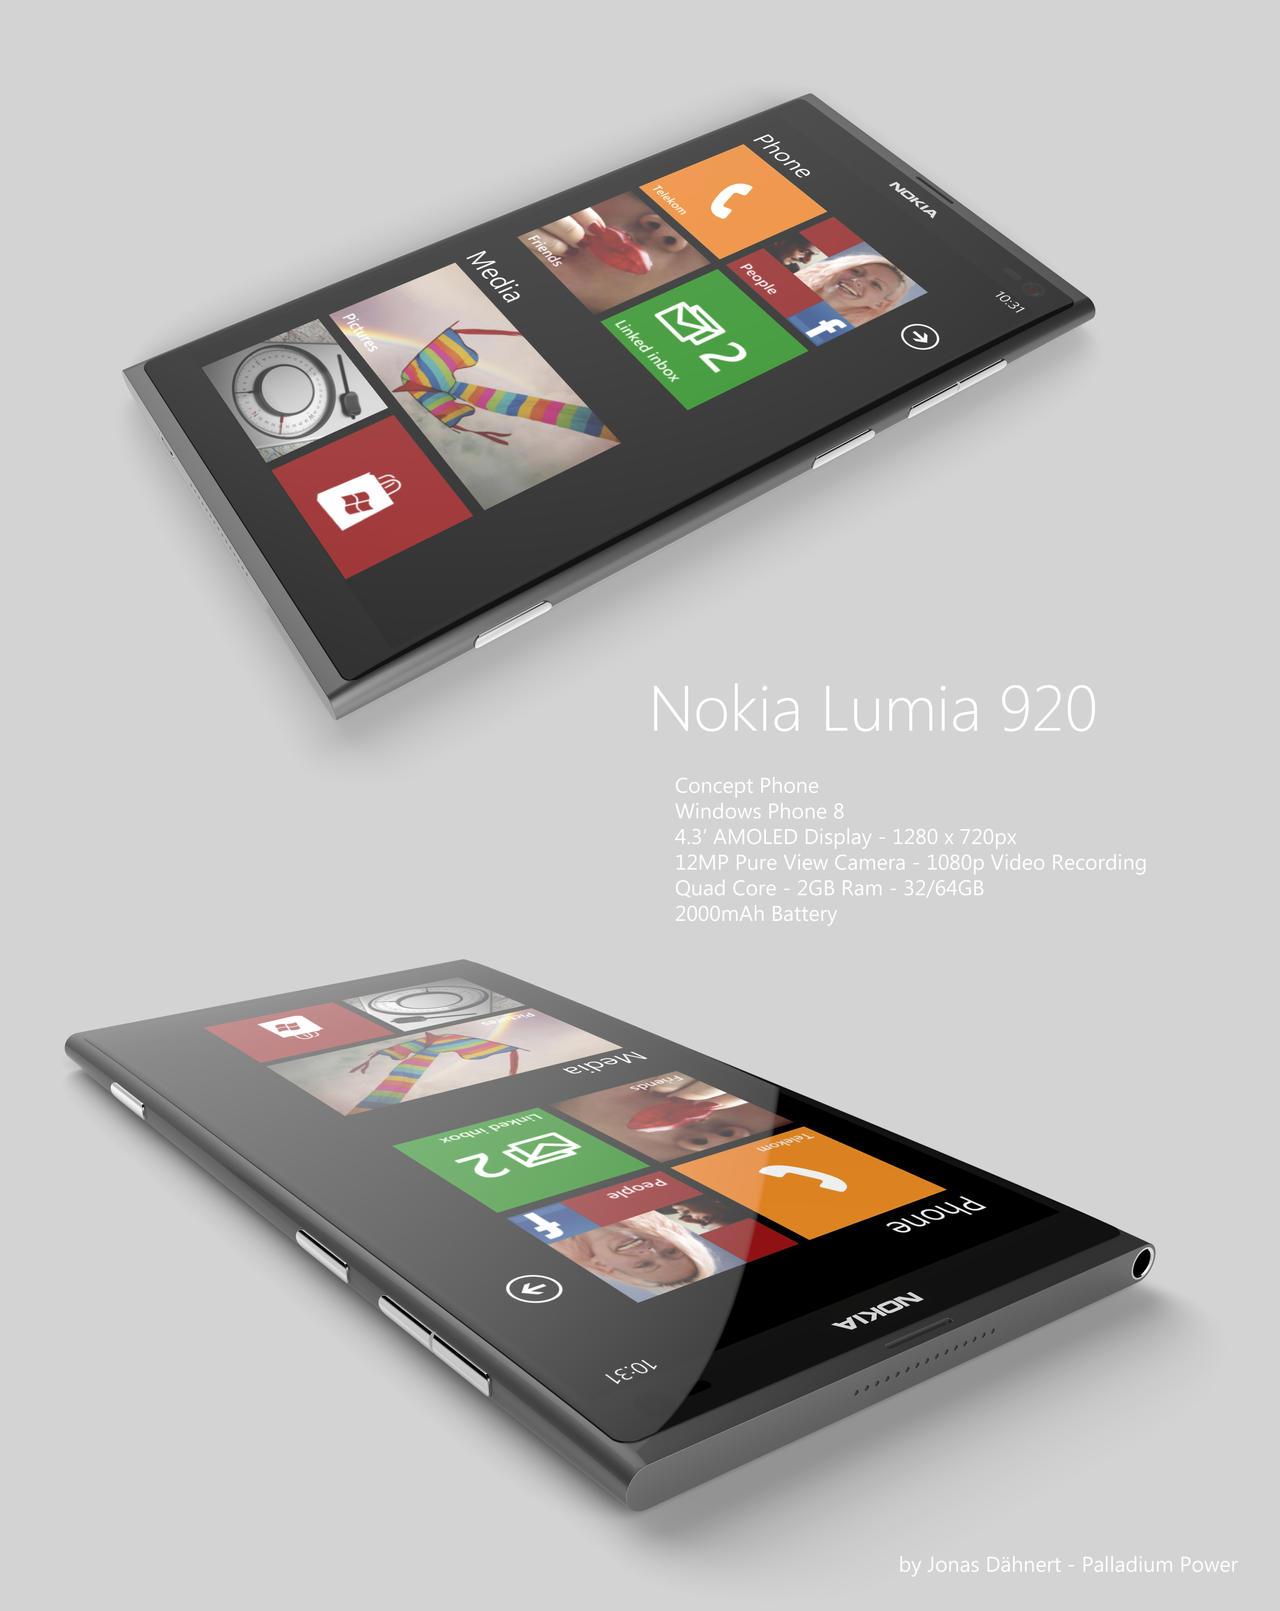 Nokia Lumia 920 Windows Phone 8 by Jonas-Daehnert